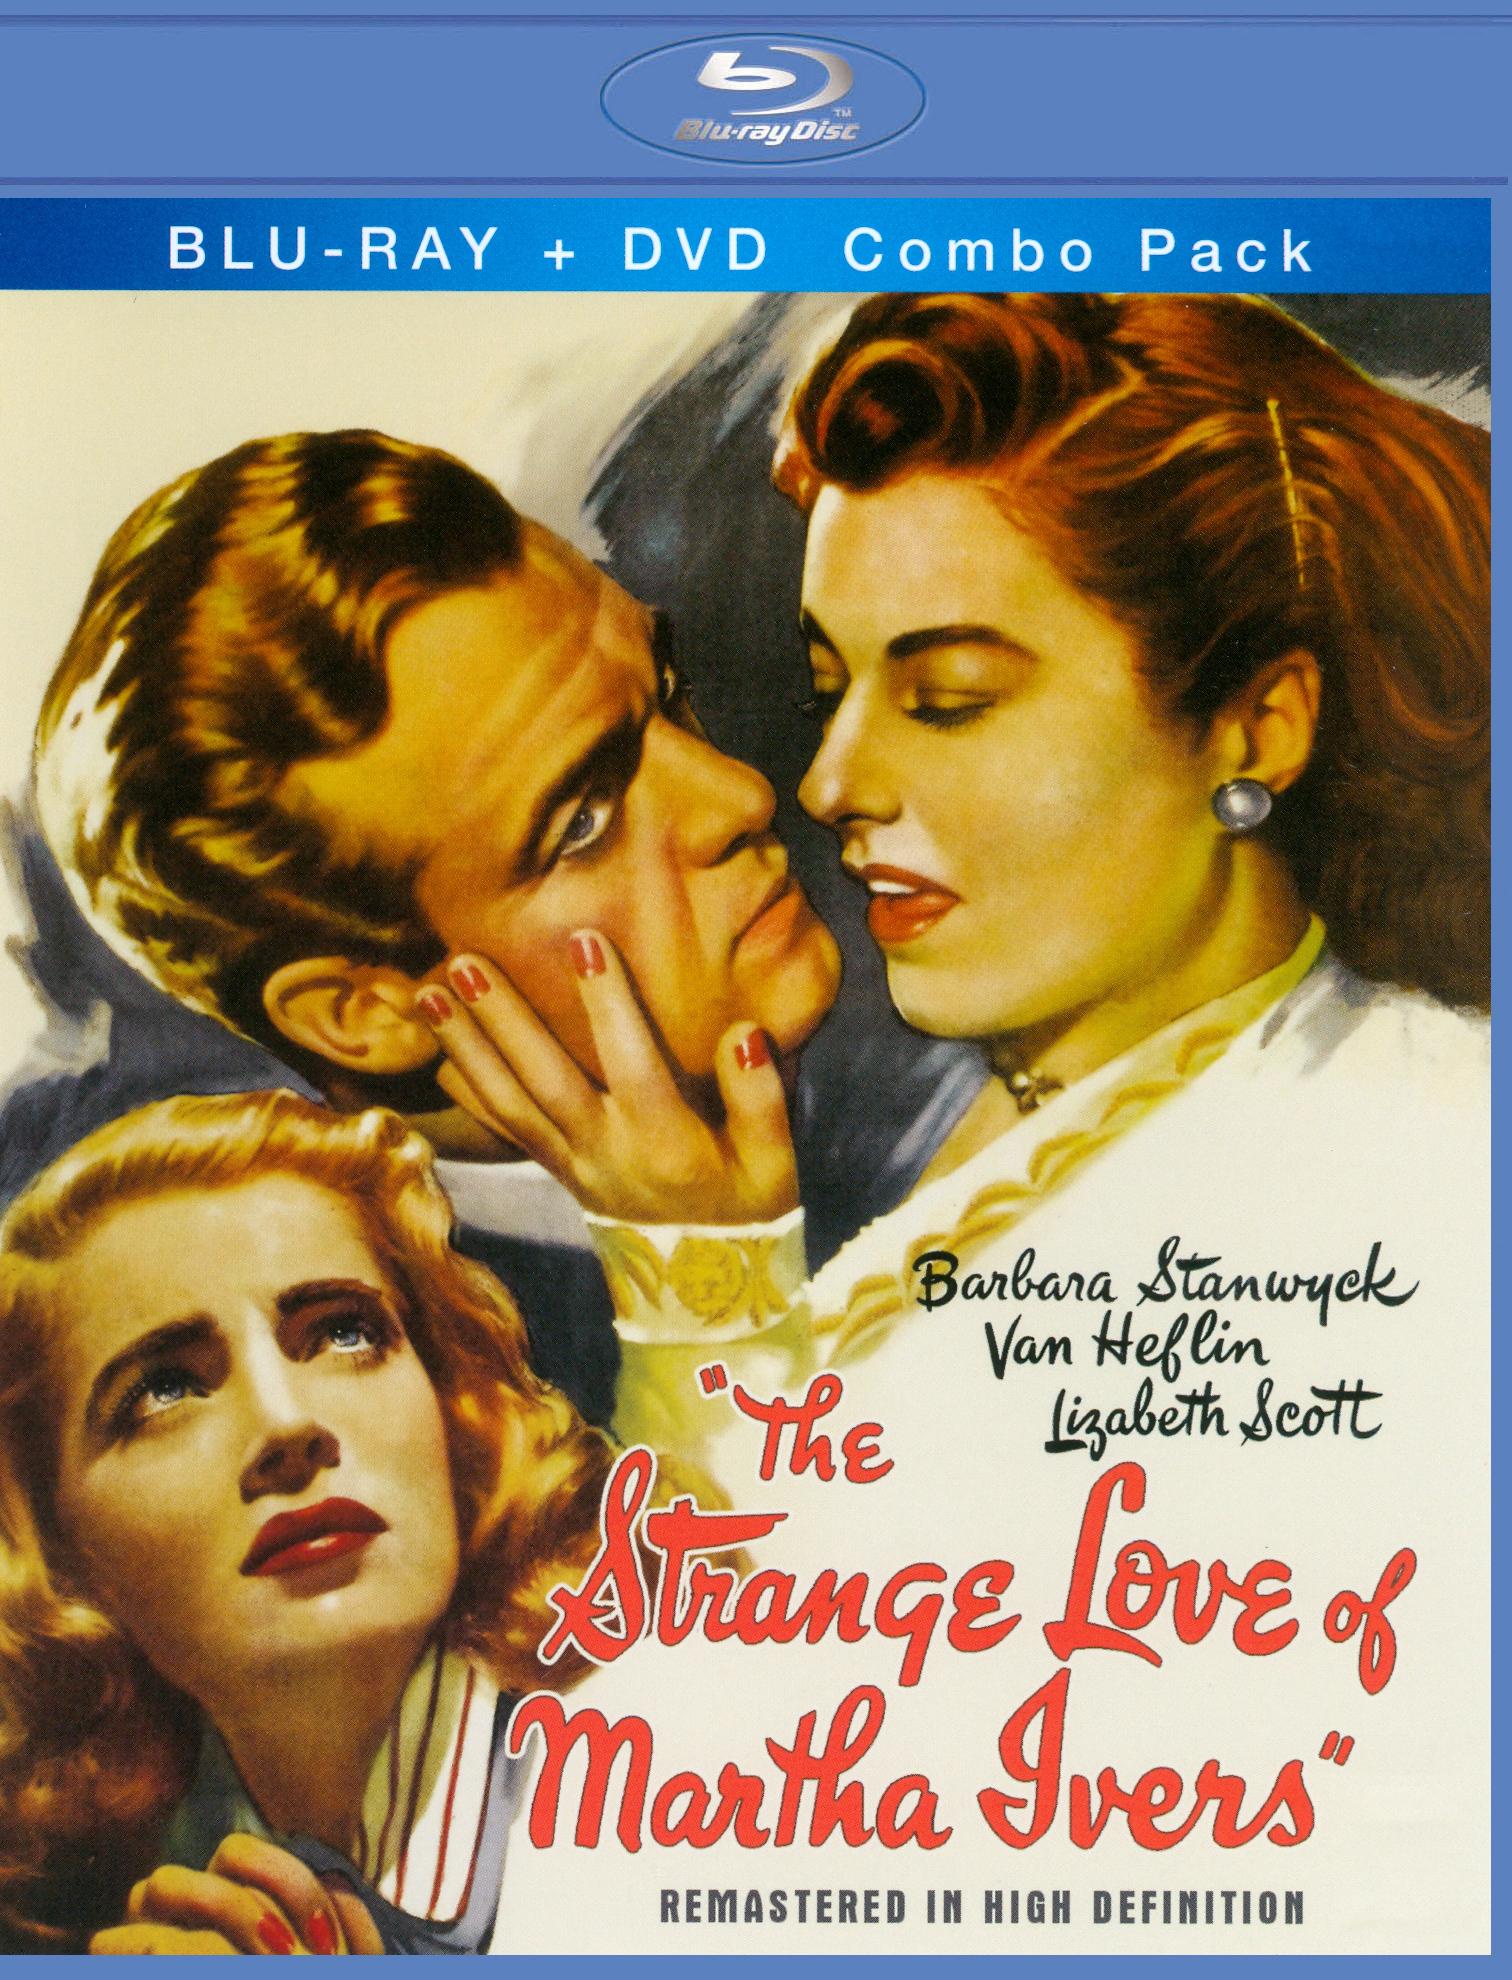 The Strange Love Of Martha Ivers [2 Discs] [blu-ray/dvd] 20152512